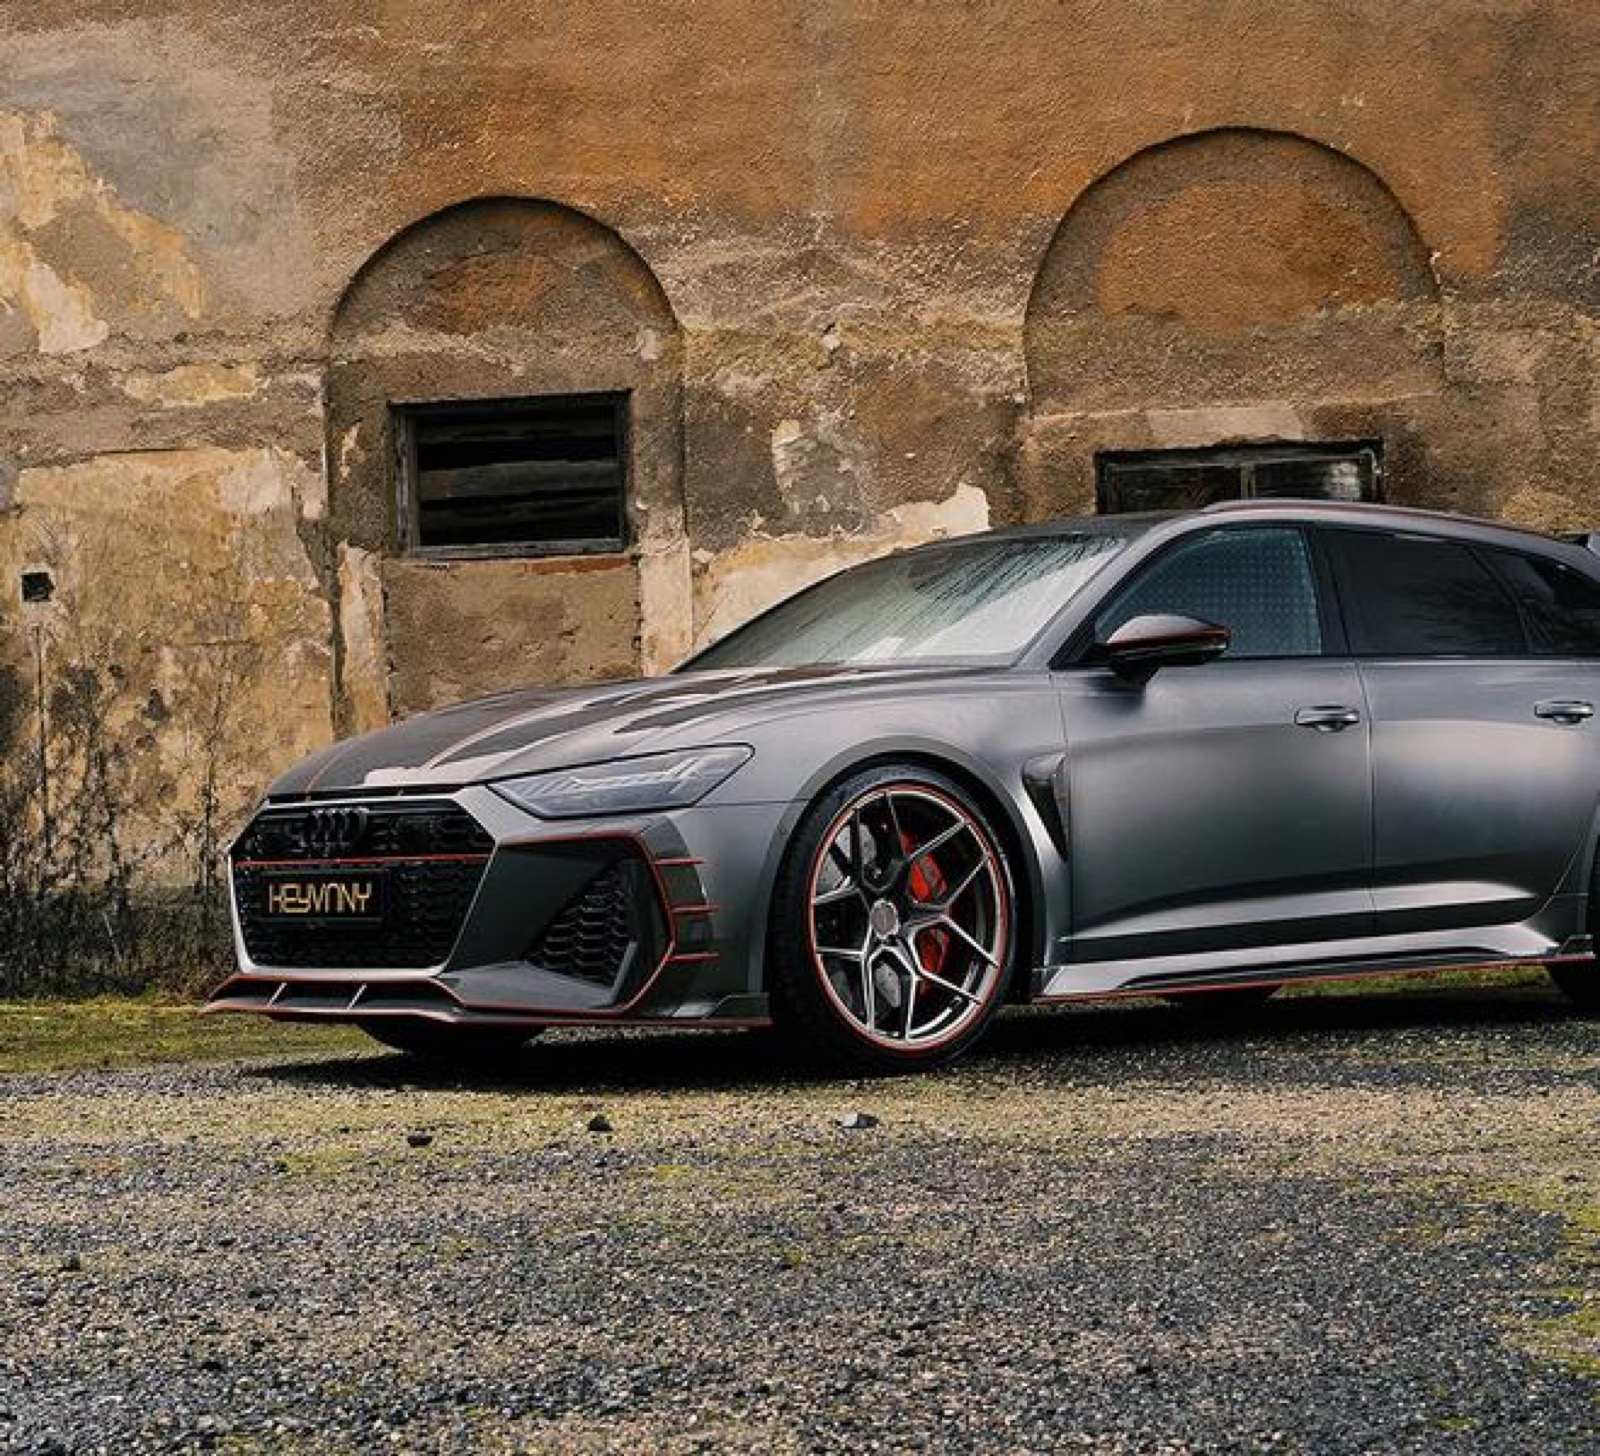 Audi-RS6-Avant-by-Keyvany-9